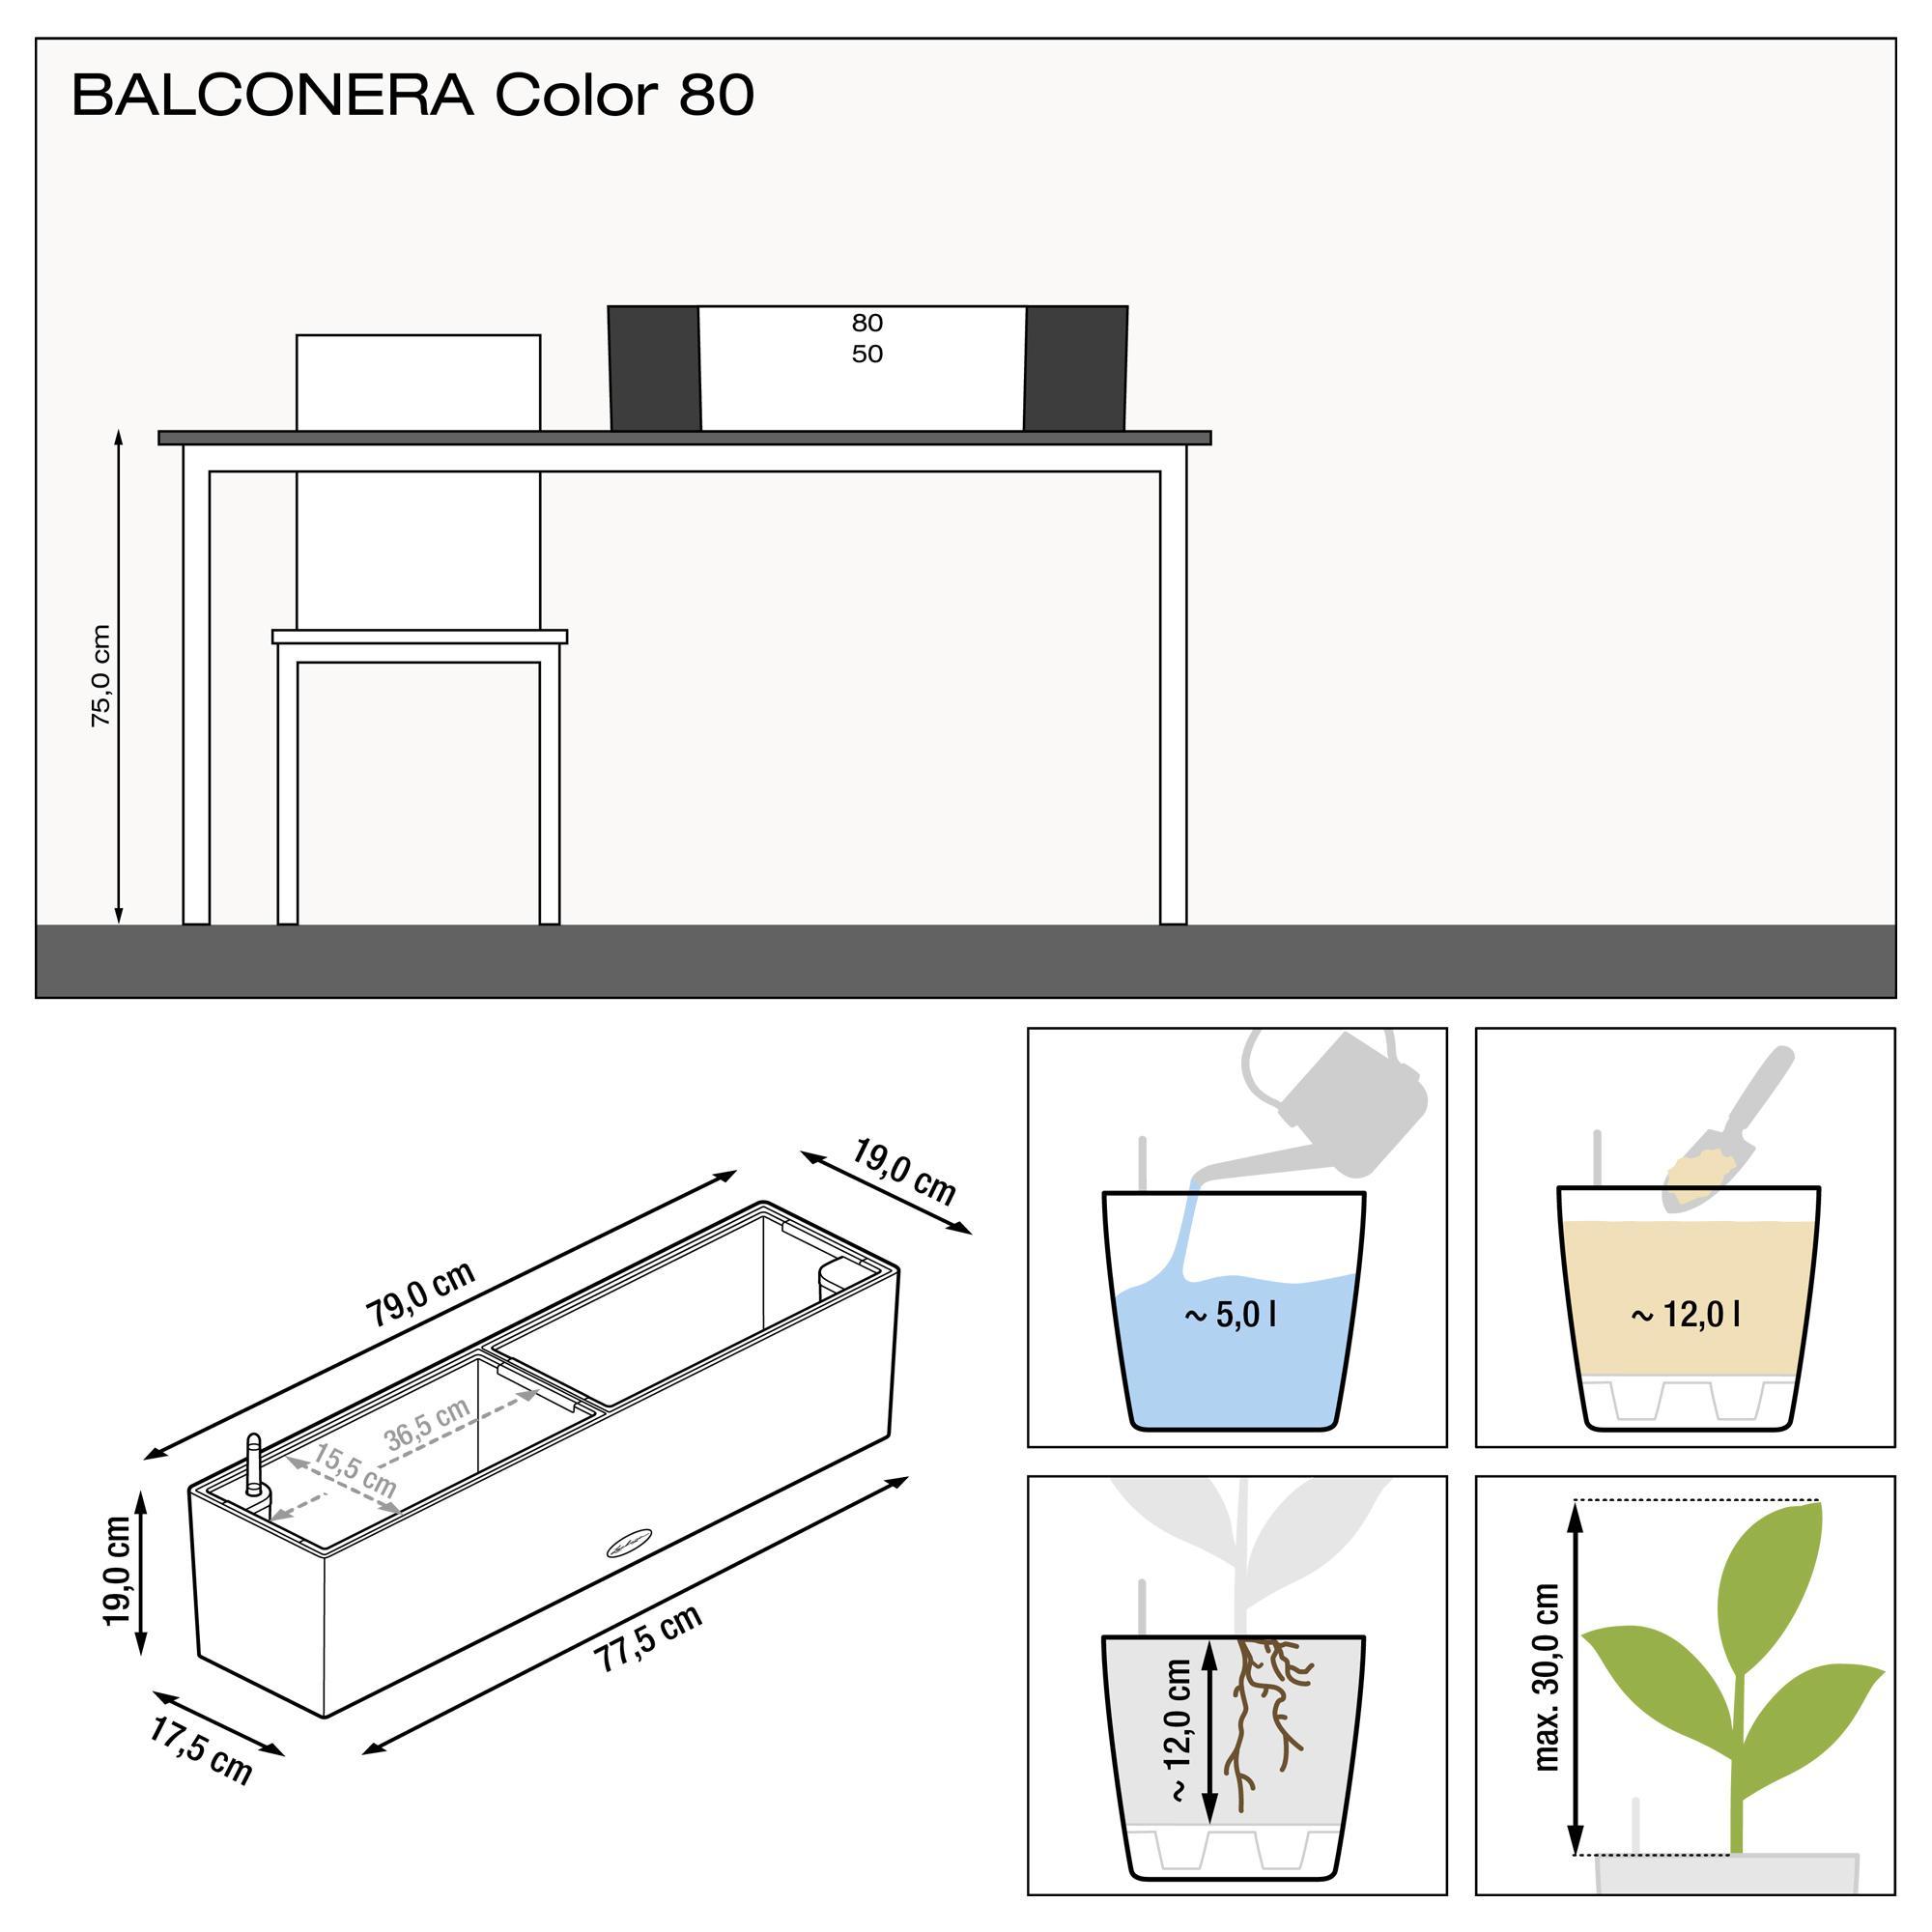 BALCONERA Color 80 blanc - Image 3